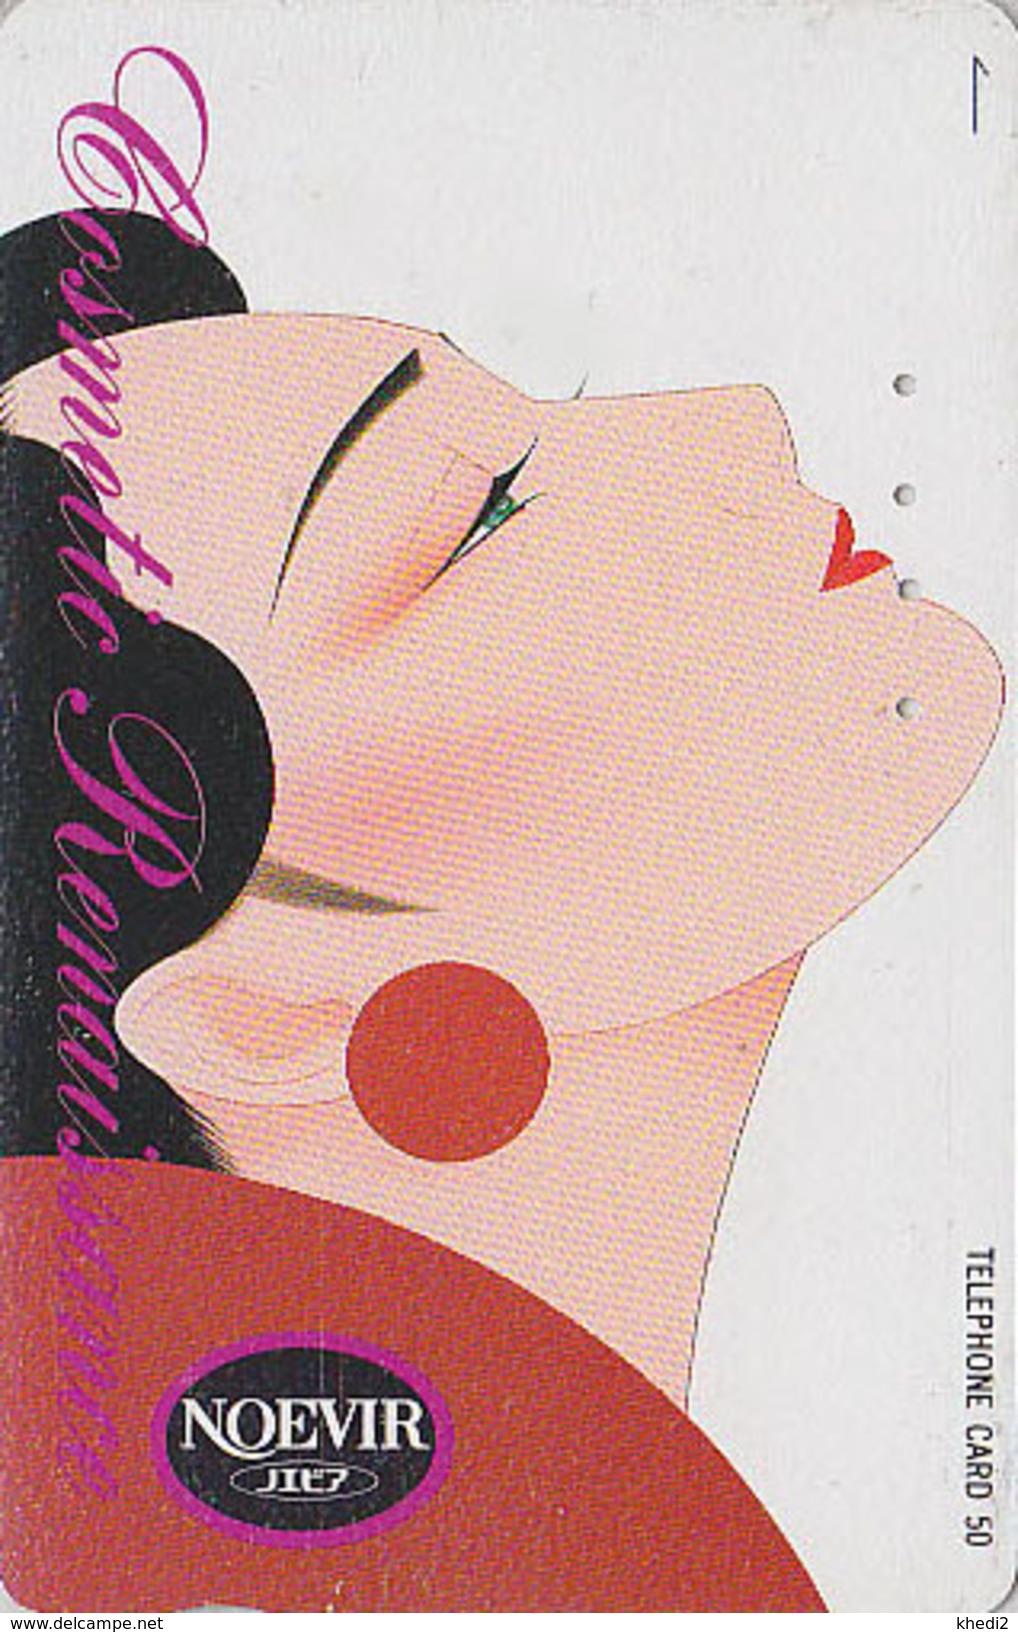 Télécarte Japon / 110-106816 - Cosmétiques NOEVIR / Femme Girl - Japan Cosmetics Cosmetic Phonecard Parfum Perfume - 214 - Parfum